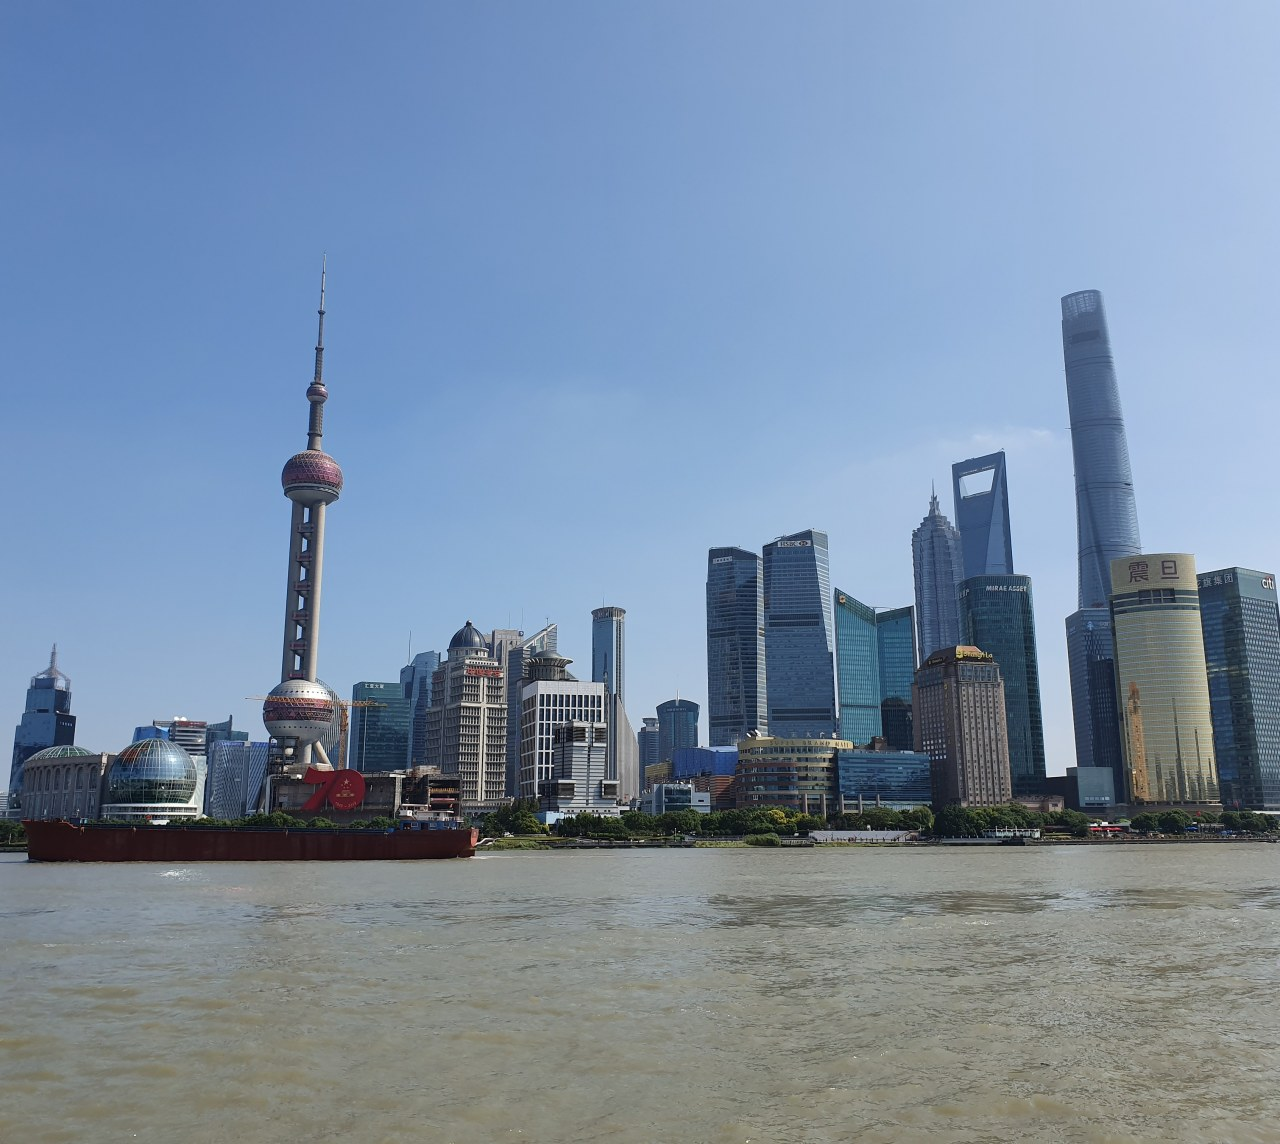 Day 40: ShanghaiSunrise